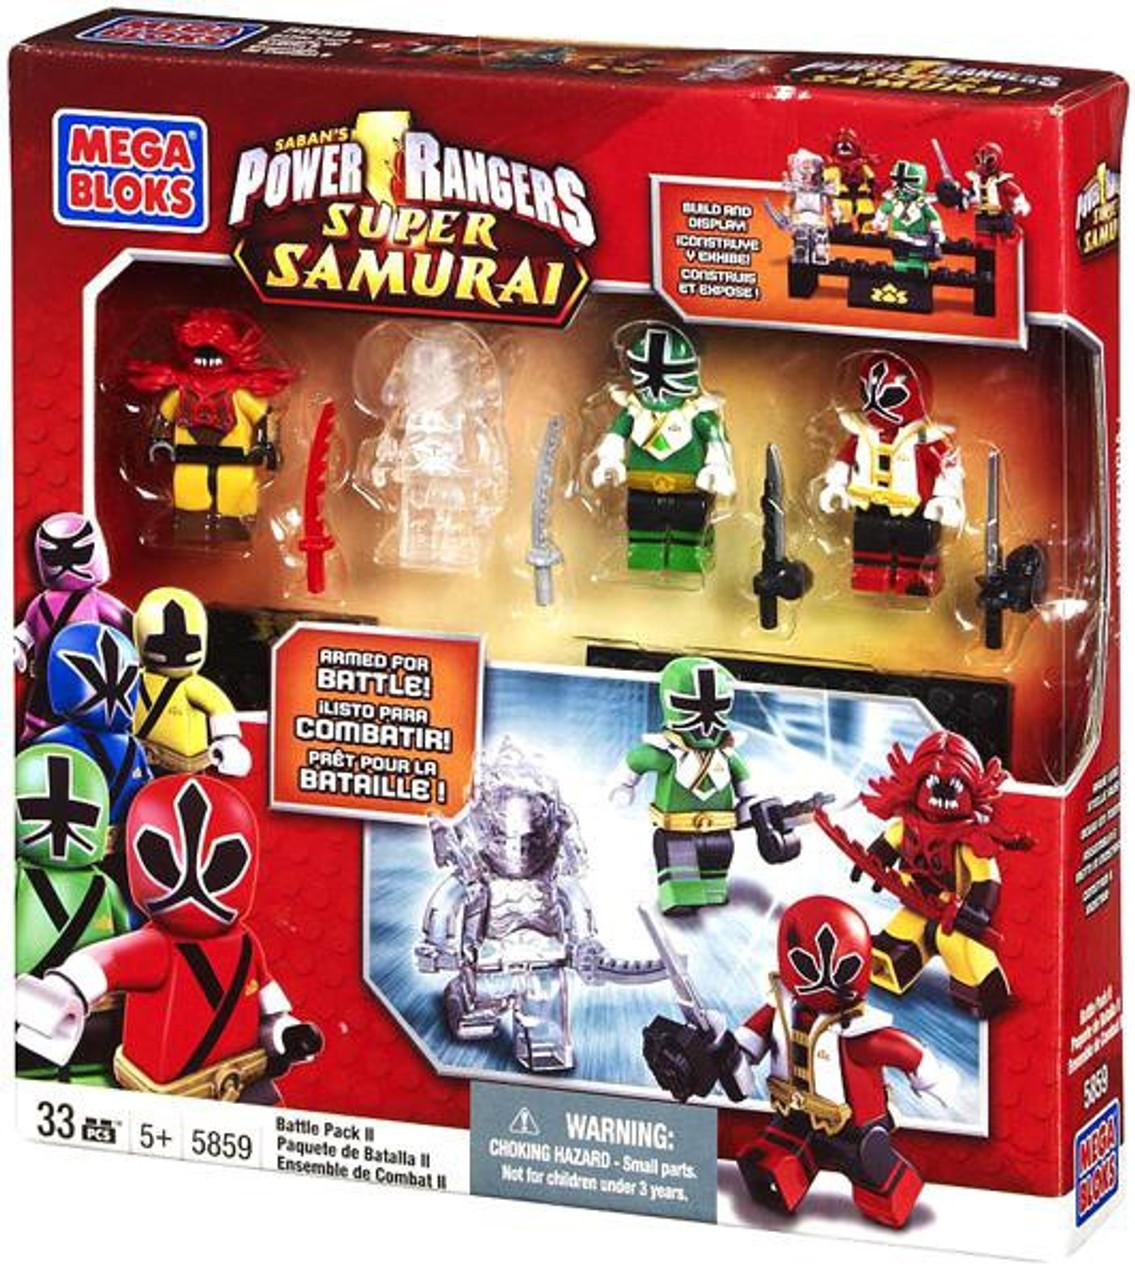 Mega Bloks Power Rangers Super Samurai Battle Pack II Exclusive Set #5859